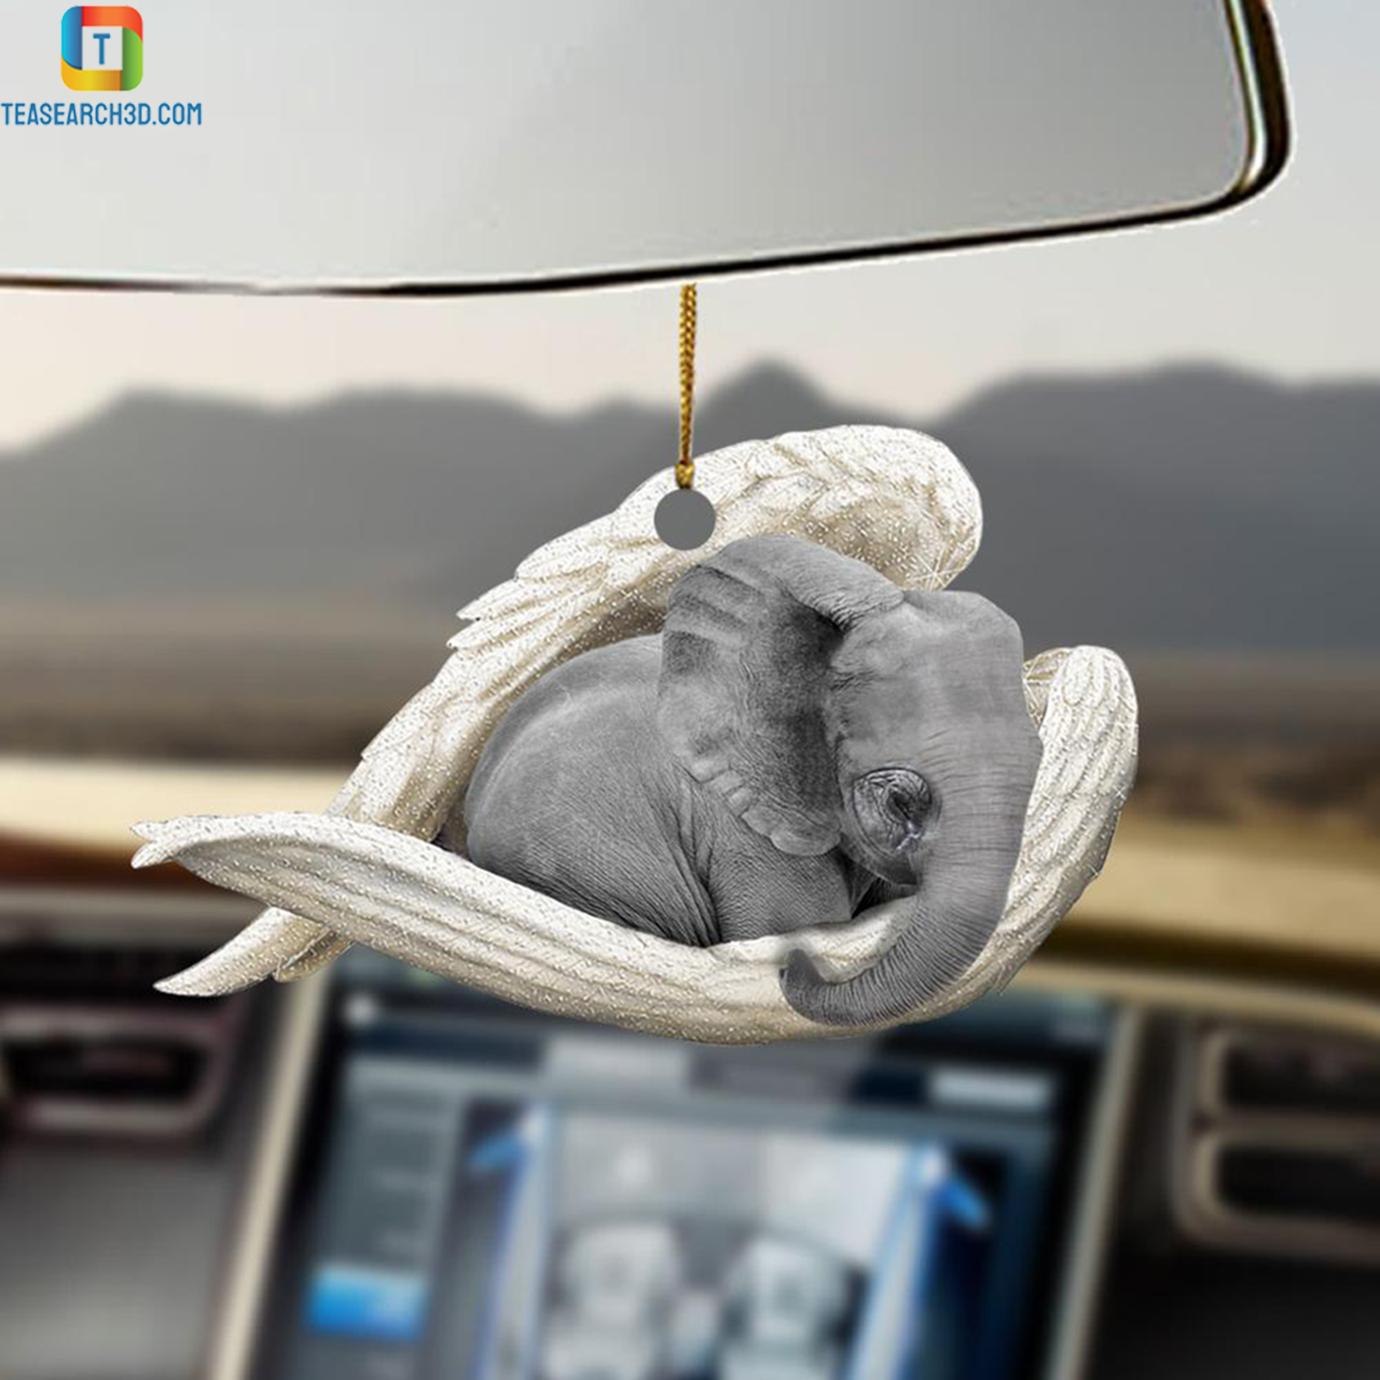 Elephant sleeping angel car hanging ornament 2